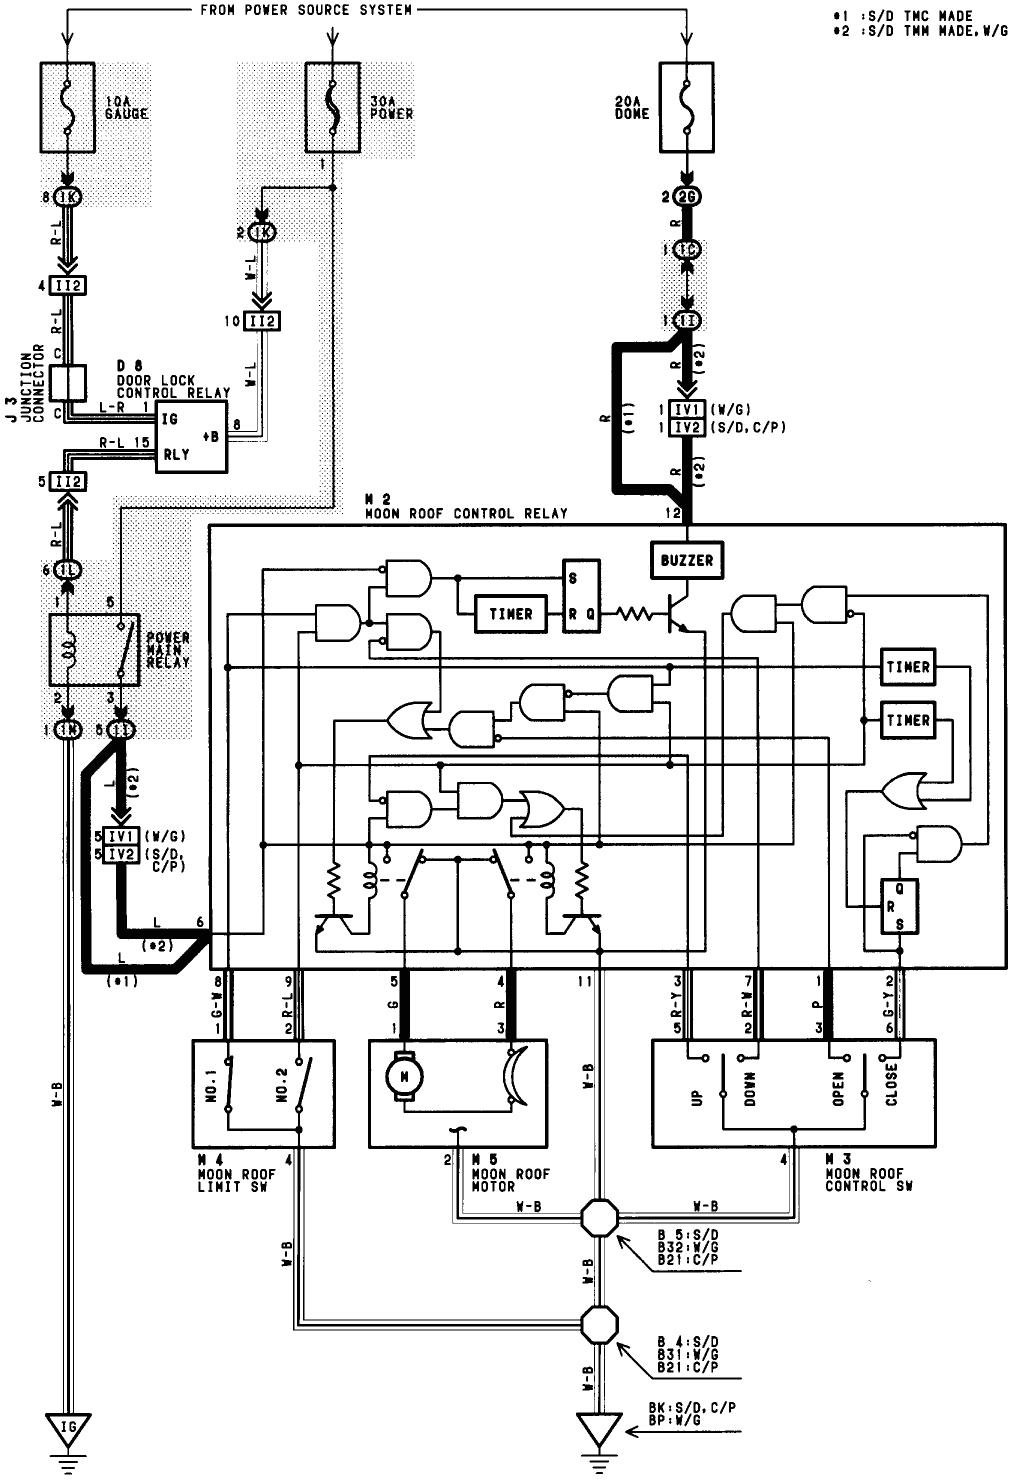 s le wiring diagram wiring diagrams posts wiring diagrams s le wiring diagram